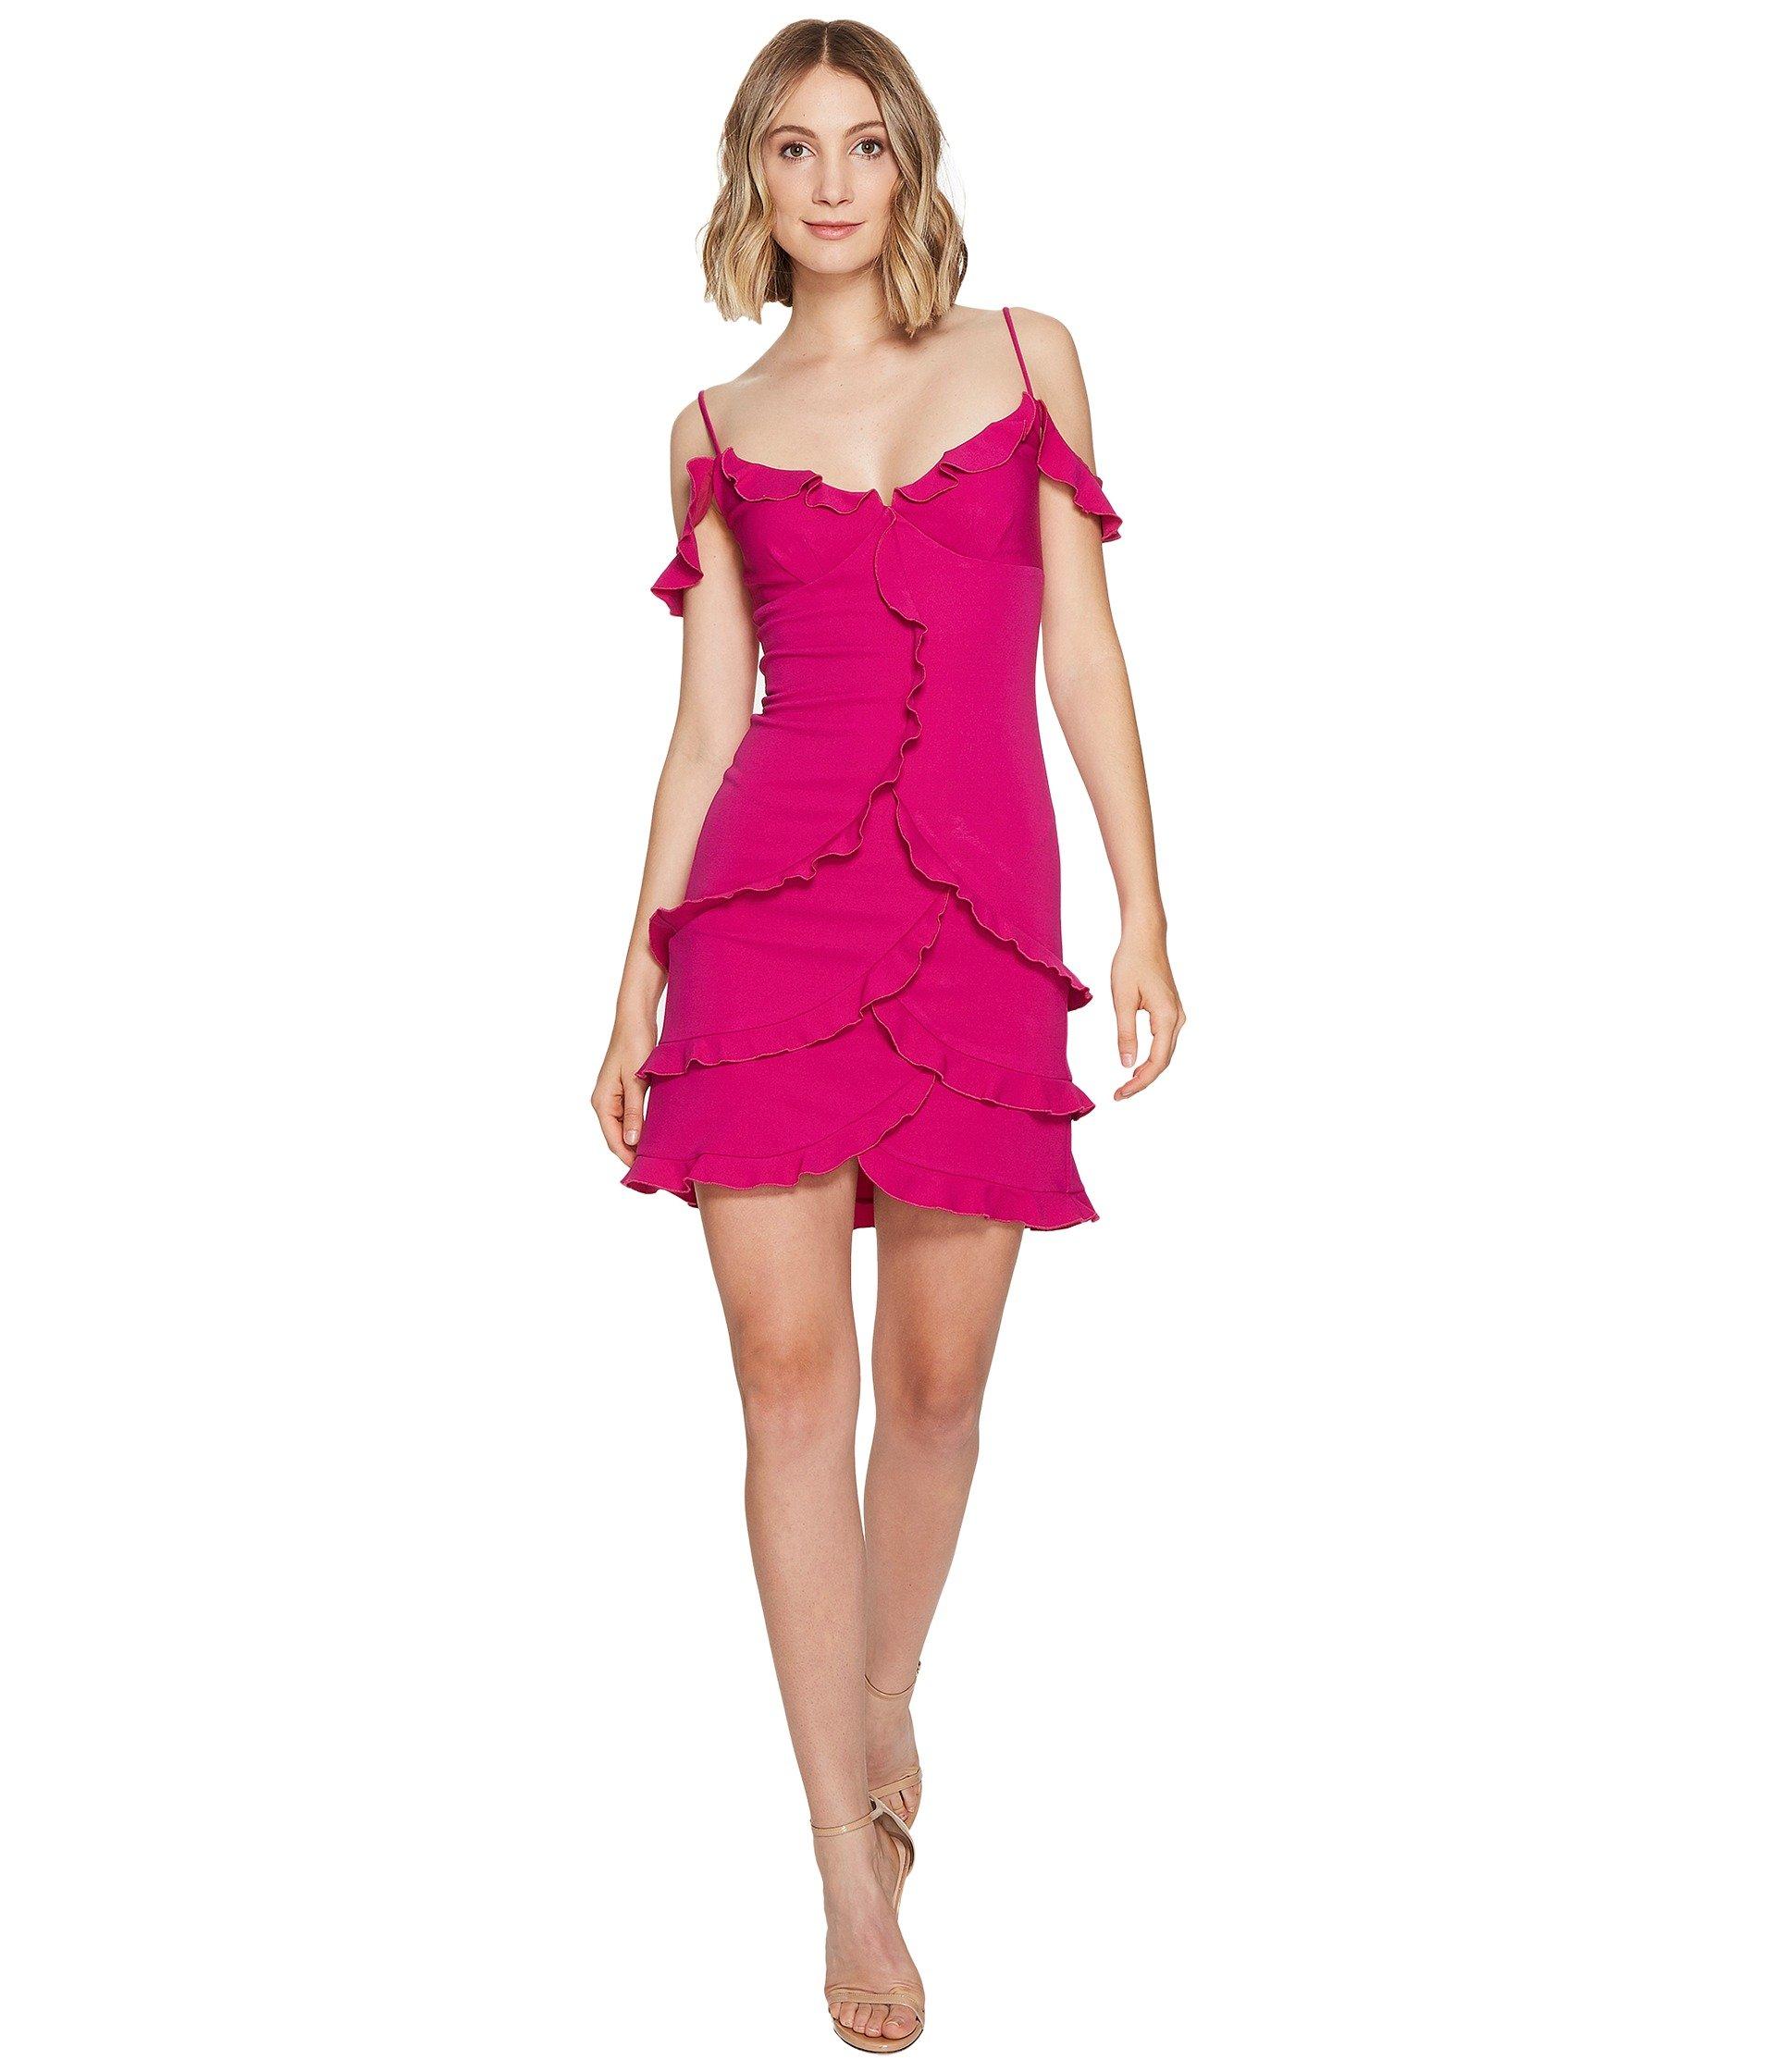 Stella Party Dress